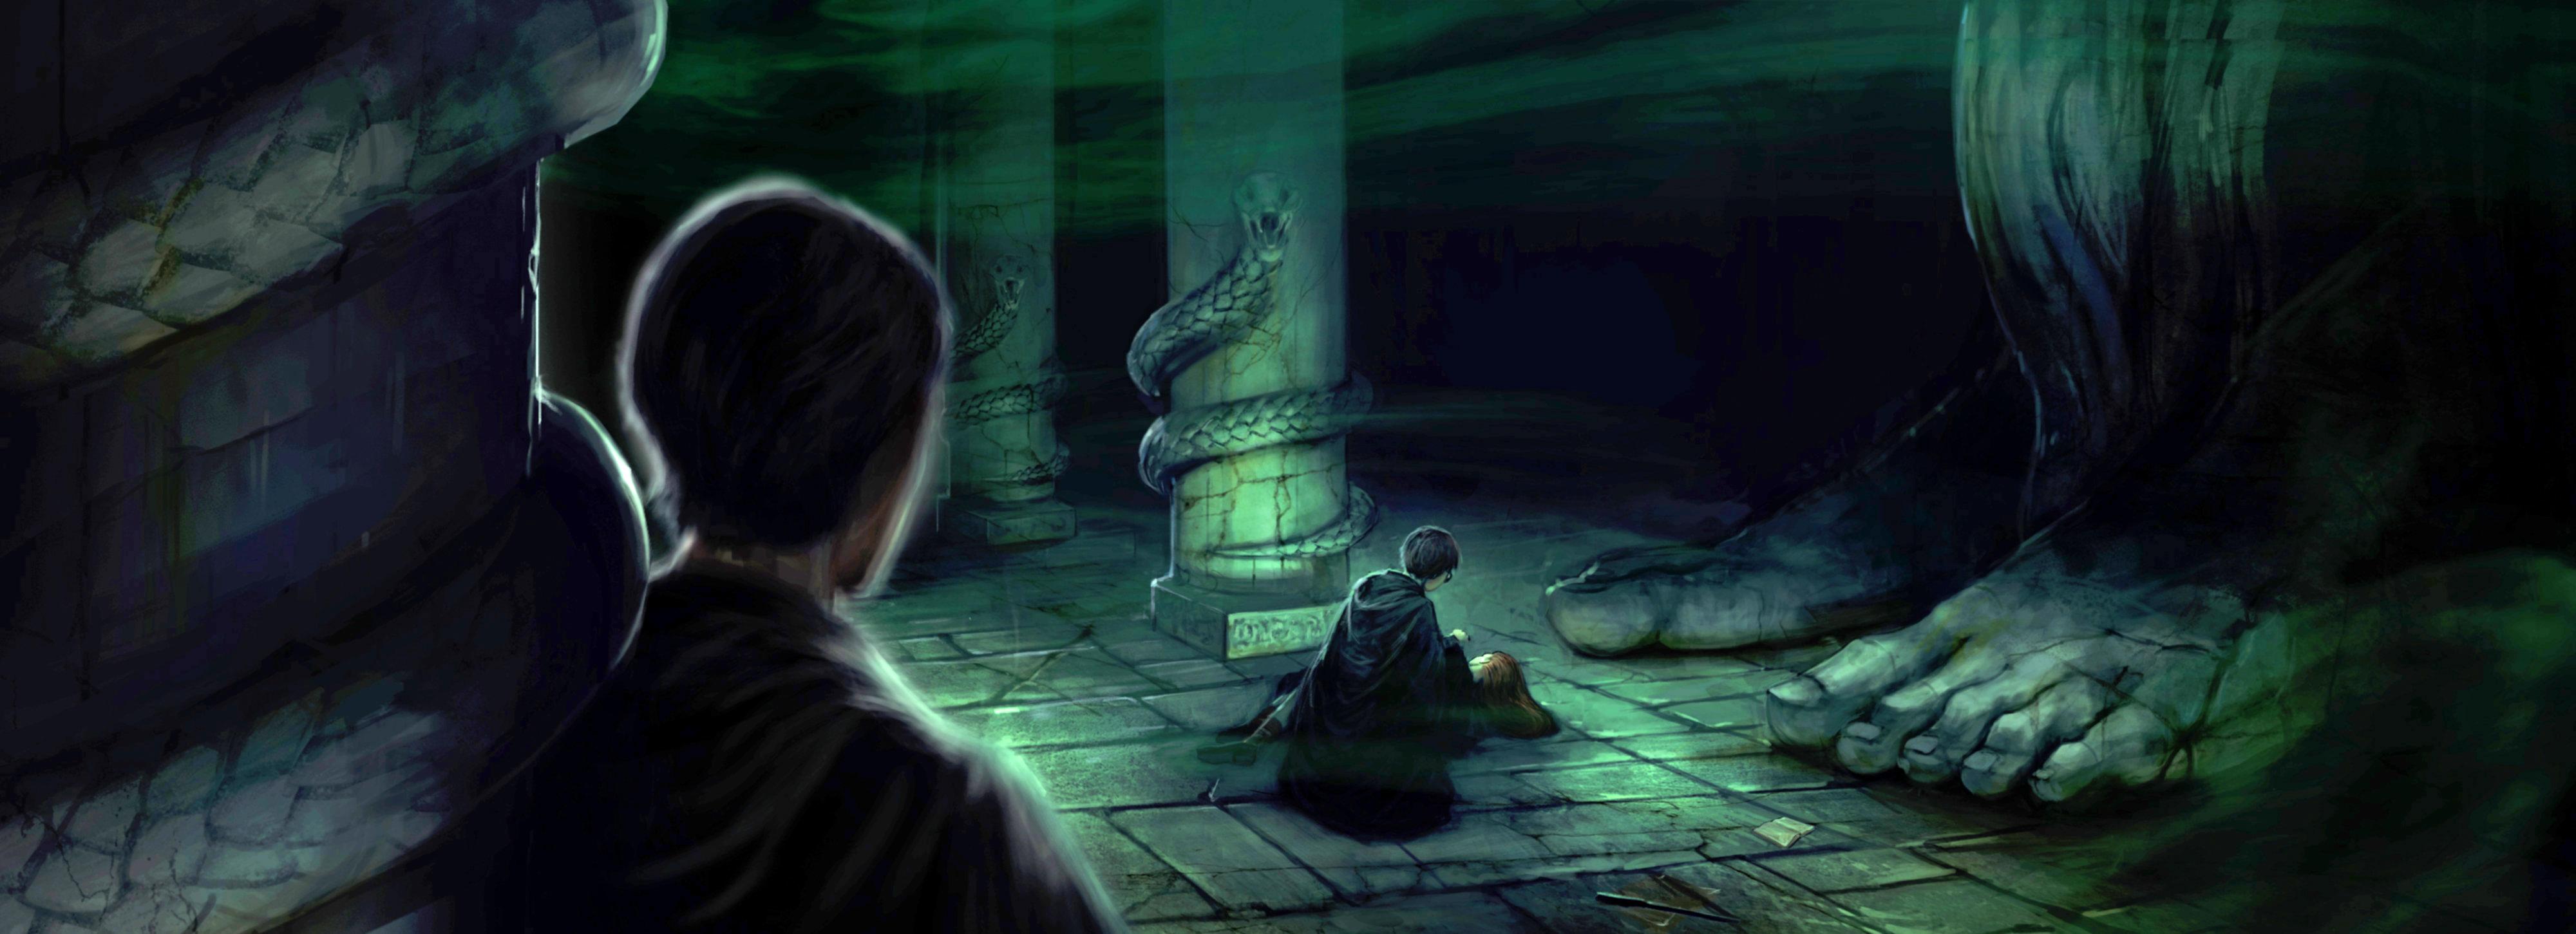 B2C17M1 Harry Ginny Tom Chamber of Secrets.jpg